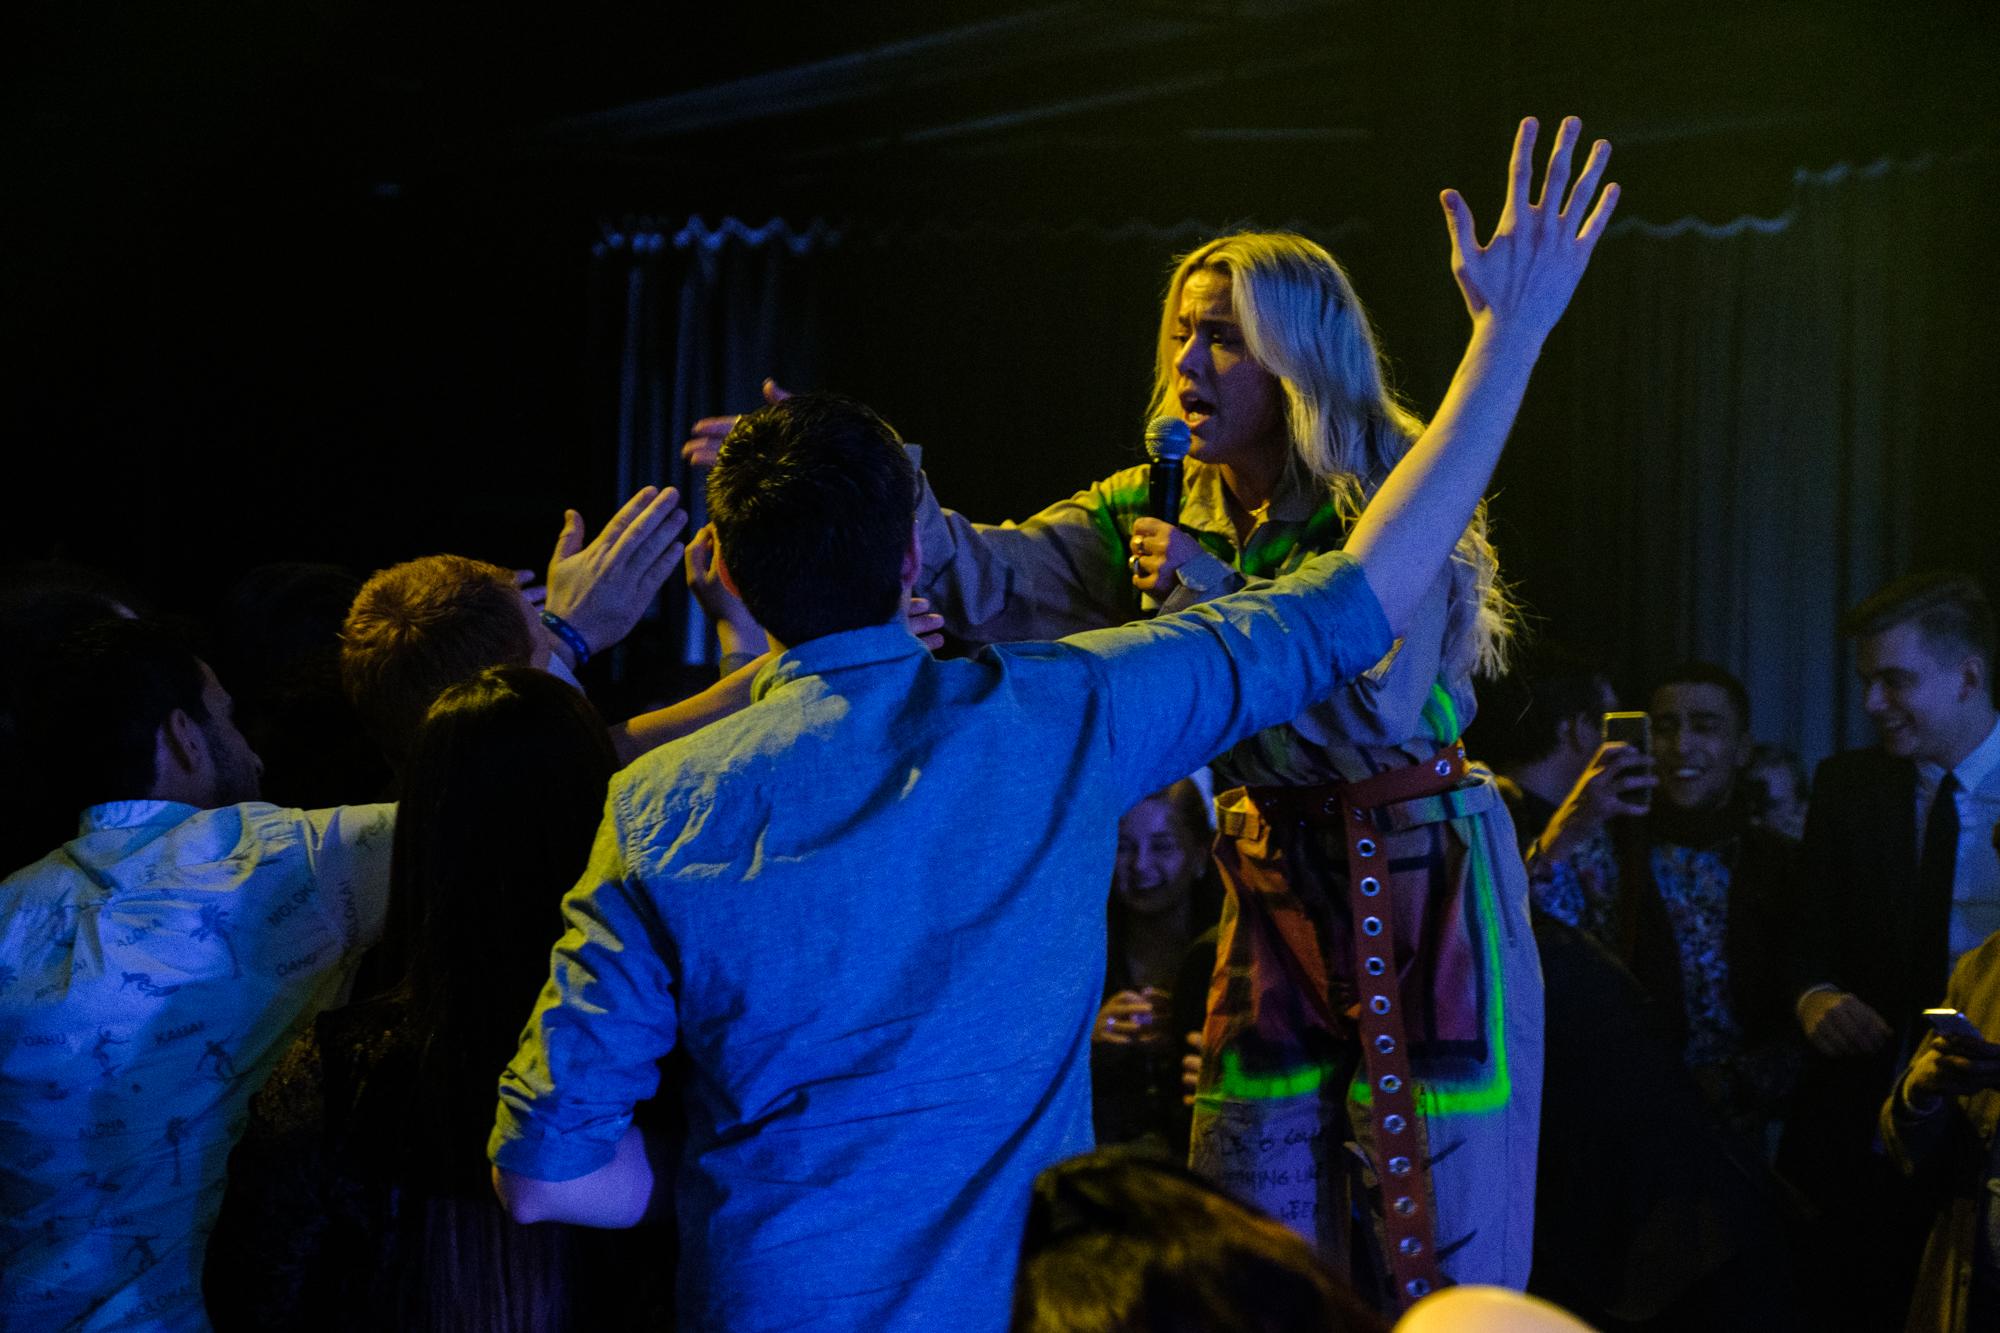 Julie Bergan og dansere leverte et fartsfylt sceneshow, som tok publikum med storm!